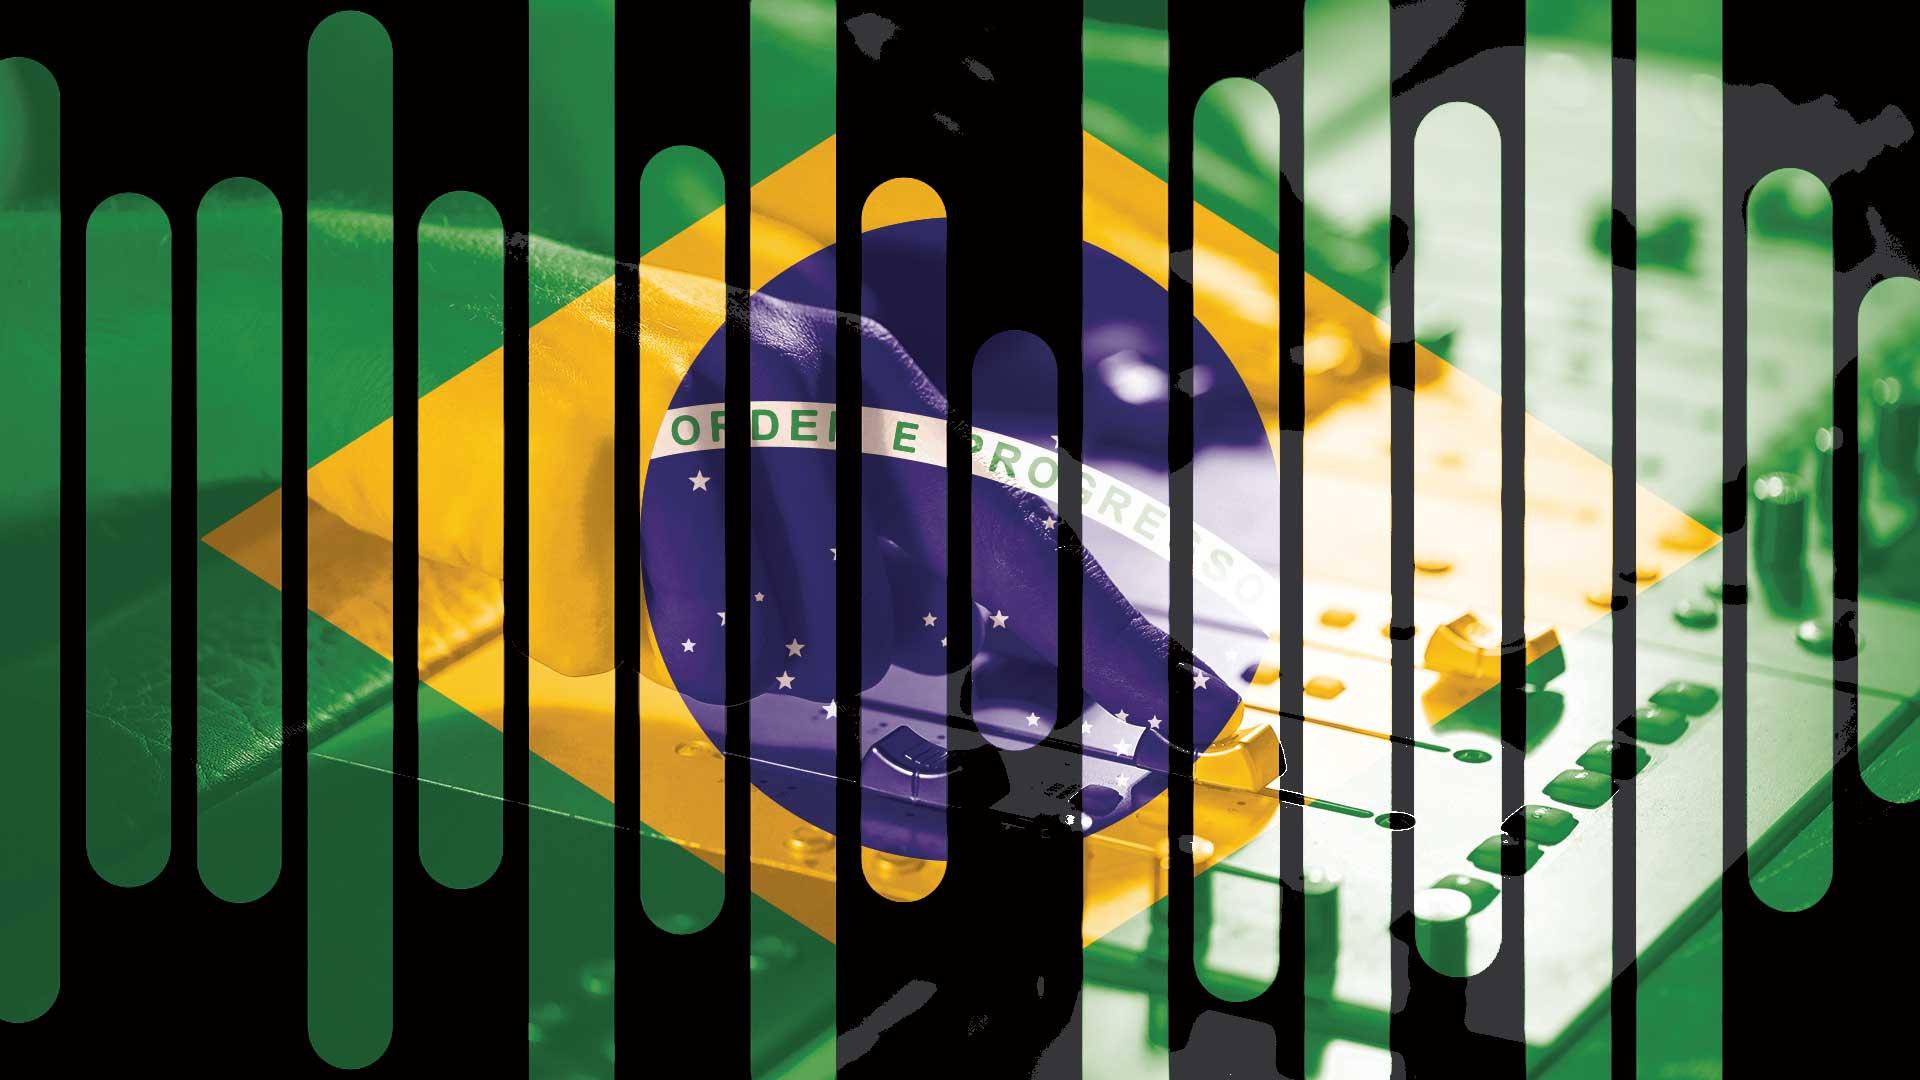 Voice-Over Services Brazil - Voquent